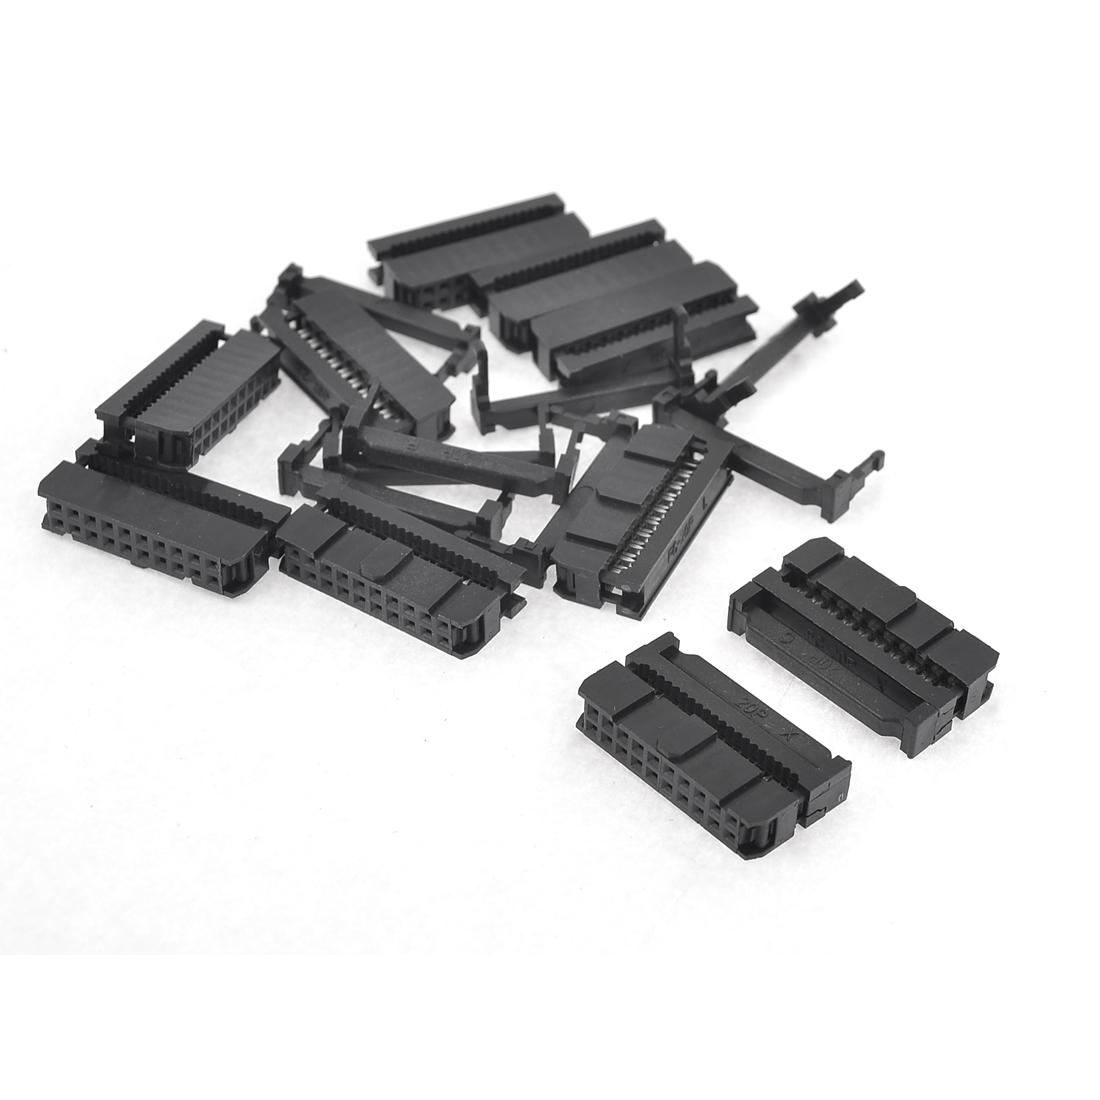 10 x Black Dual Row 20 Pin IDC Socket Connector Female Header FC-20P